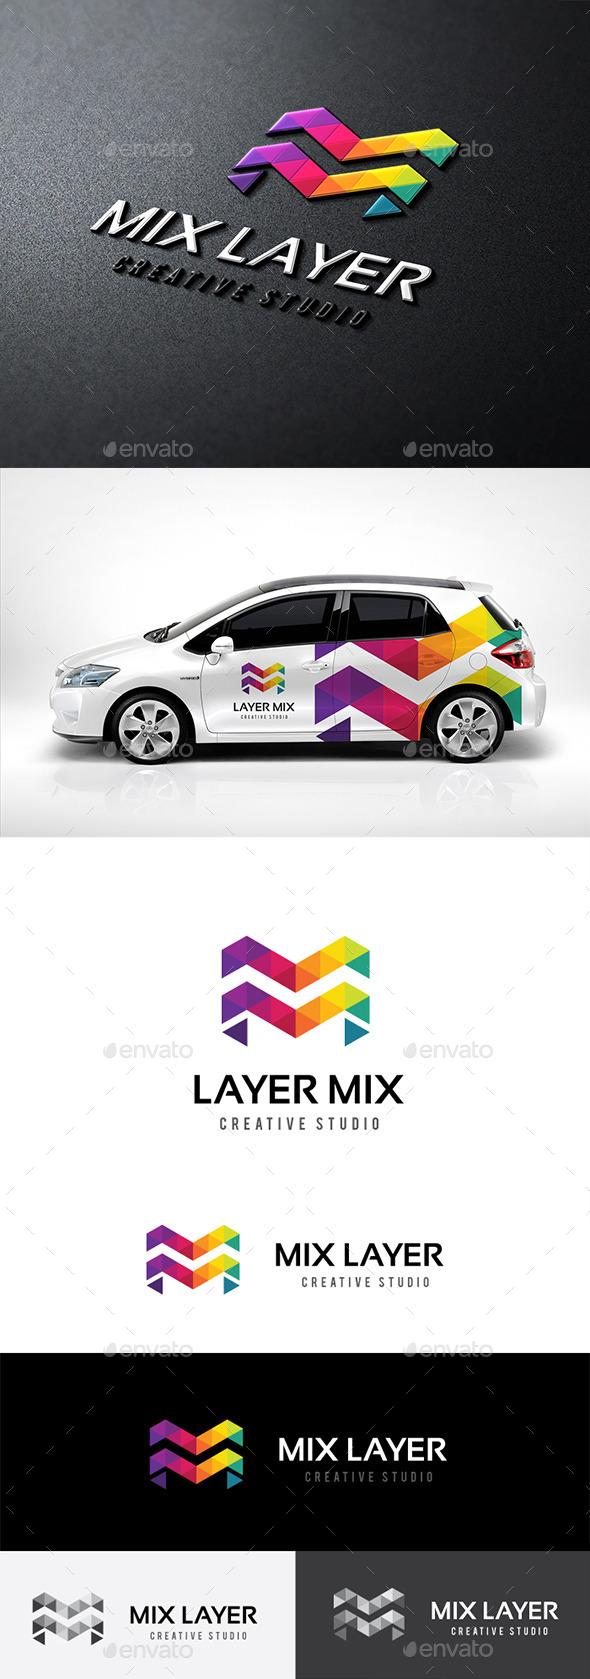 GraphicRiver Mix Layer 11373640